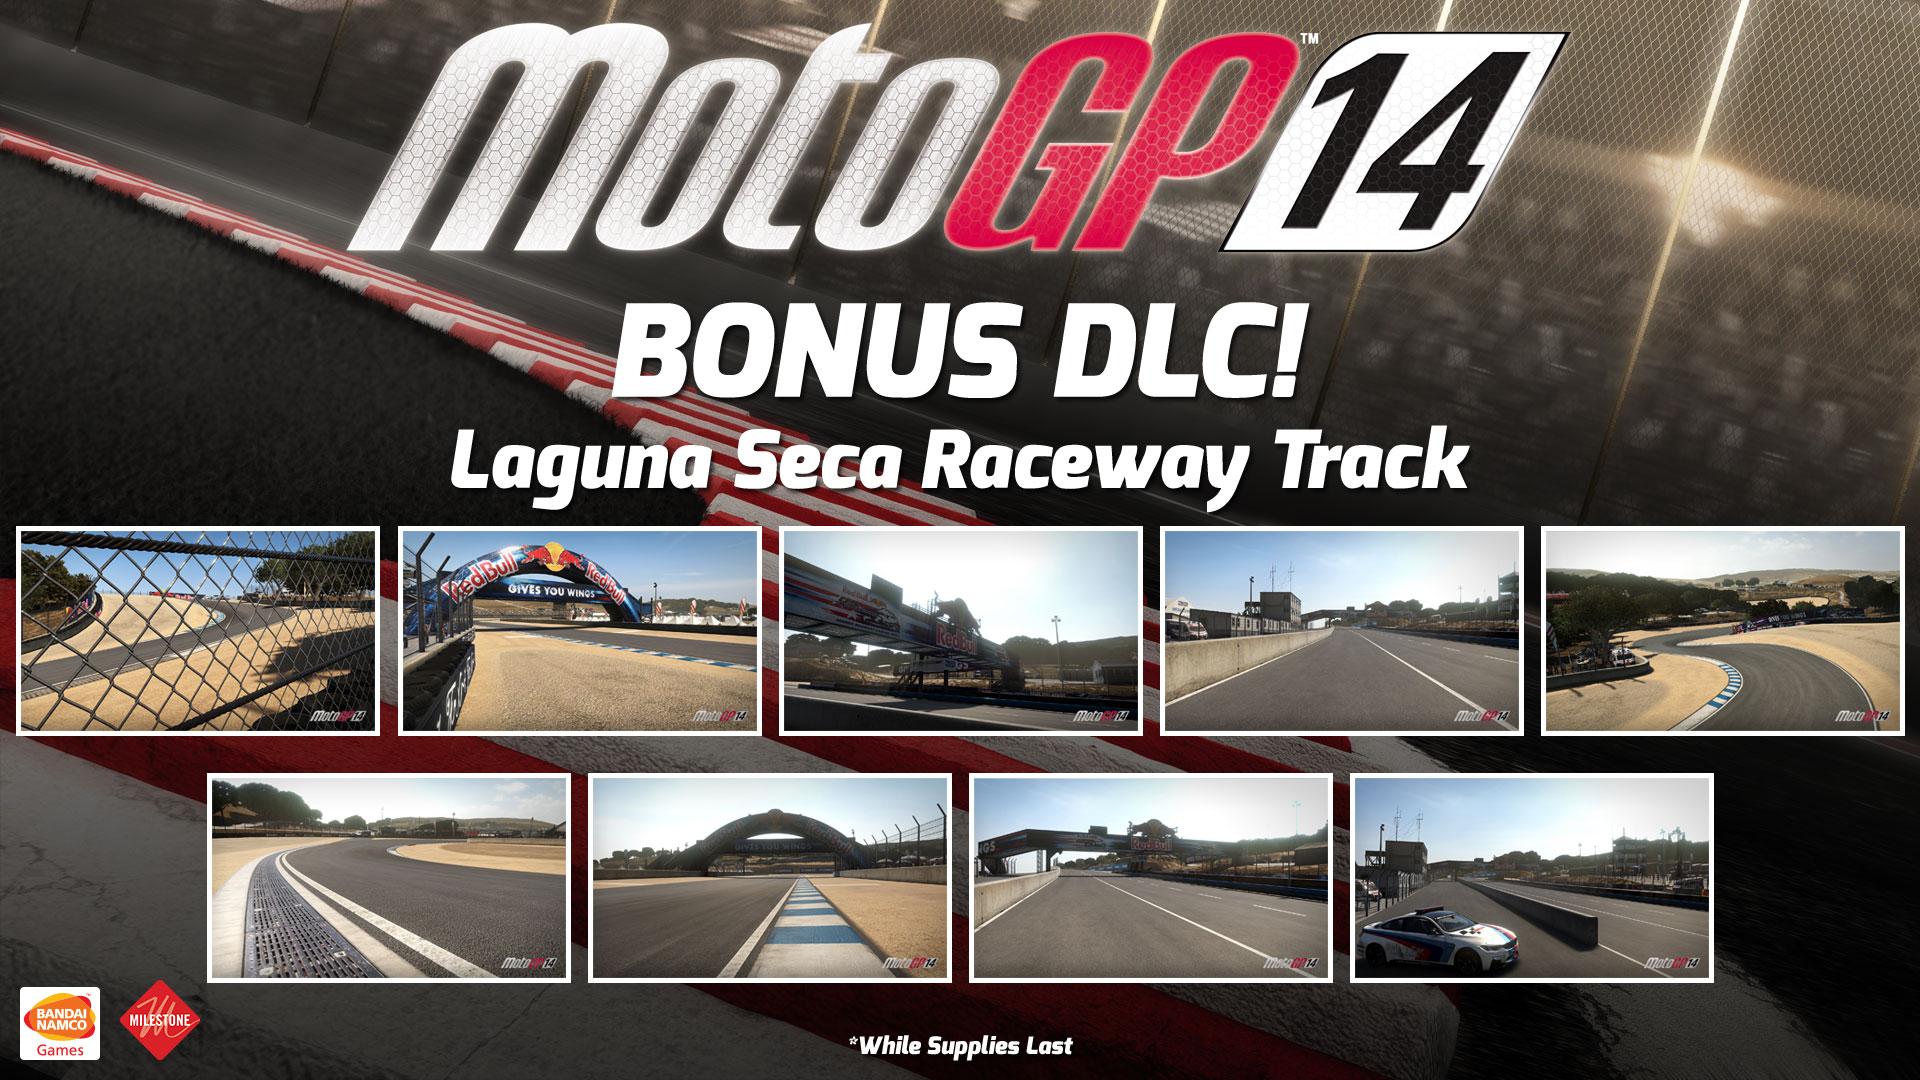 Laguna Seca PS4 DLC Free For 'MotoGP 14' If Purchased at GameStop   High-Def Digest